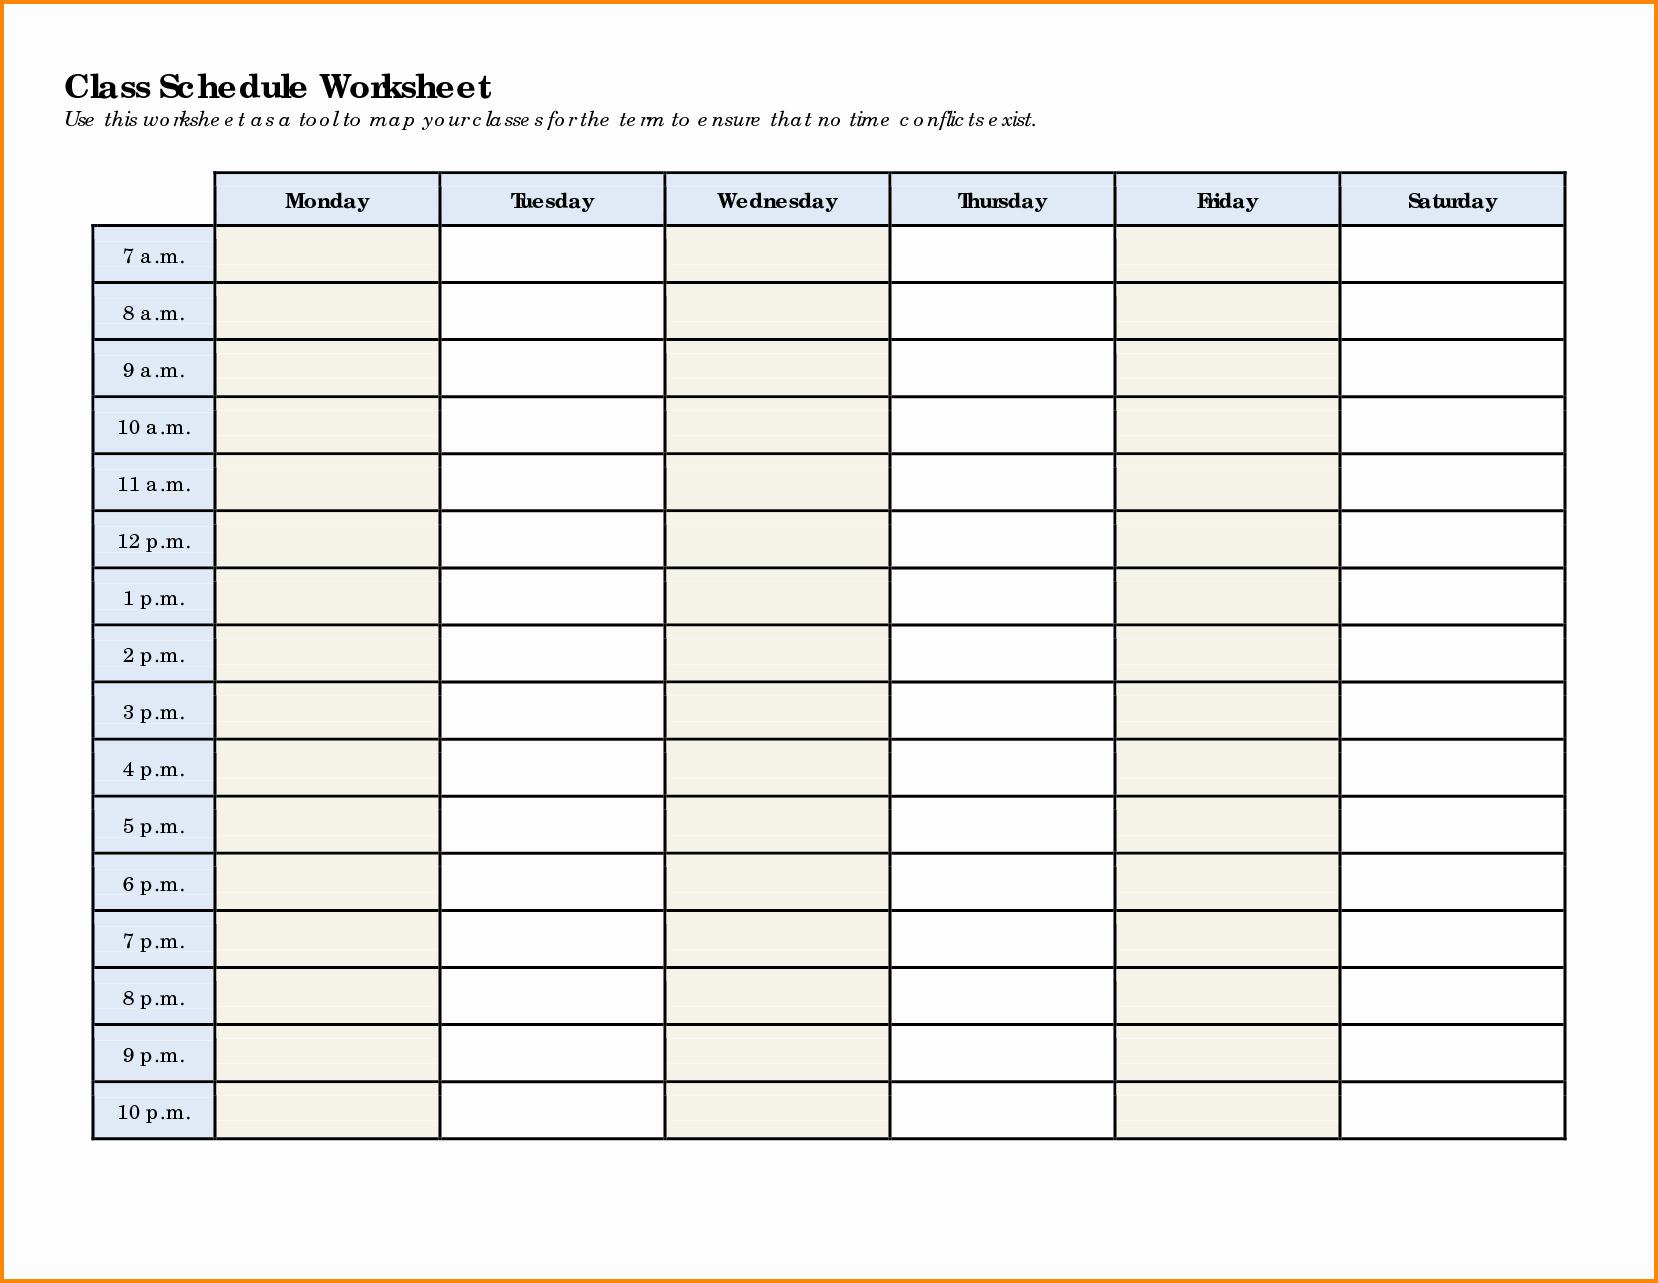 Weekly College Schedule Template Best Of 7 Weekly Class Schedule Template